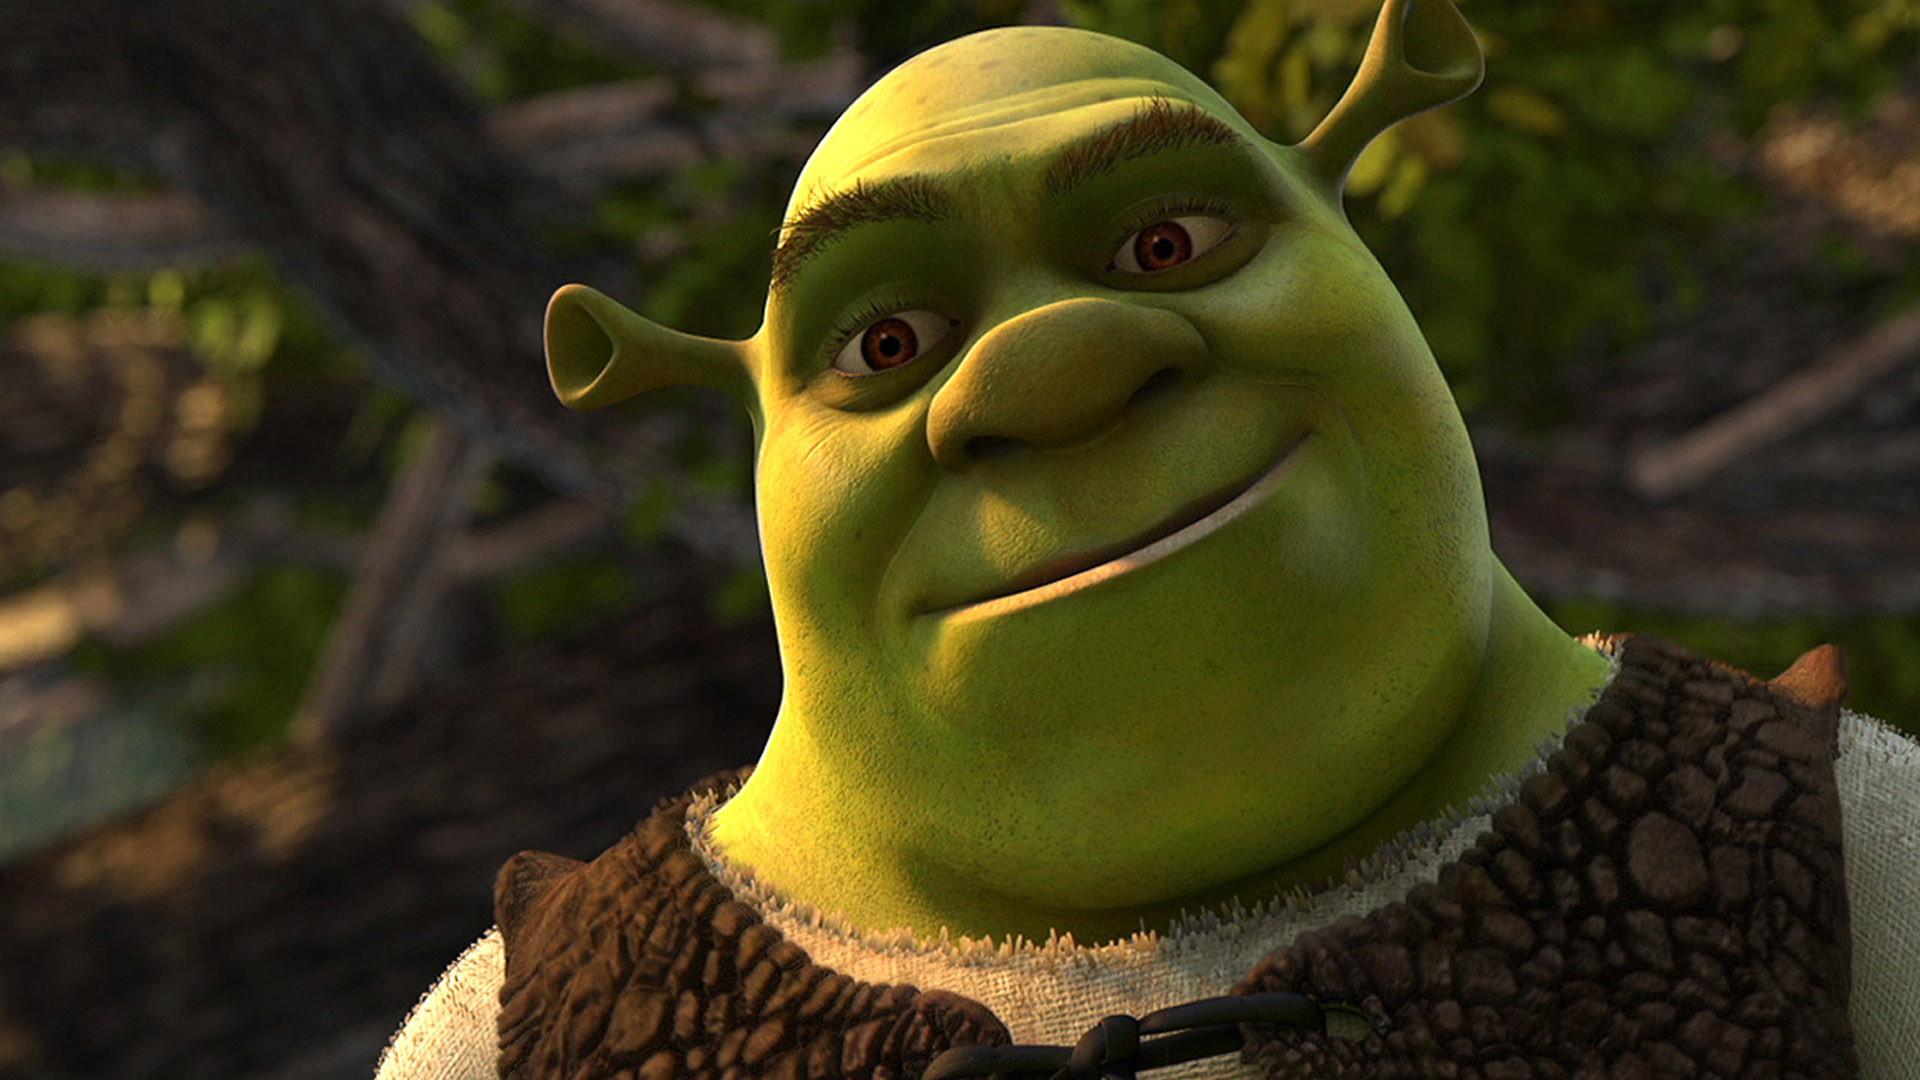 Shrek Wallpapers (66+ images)